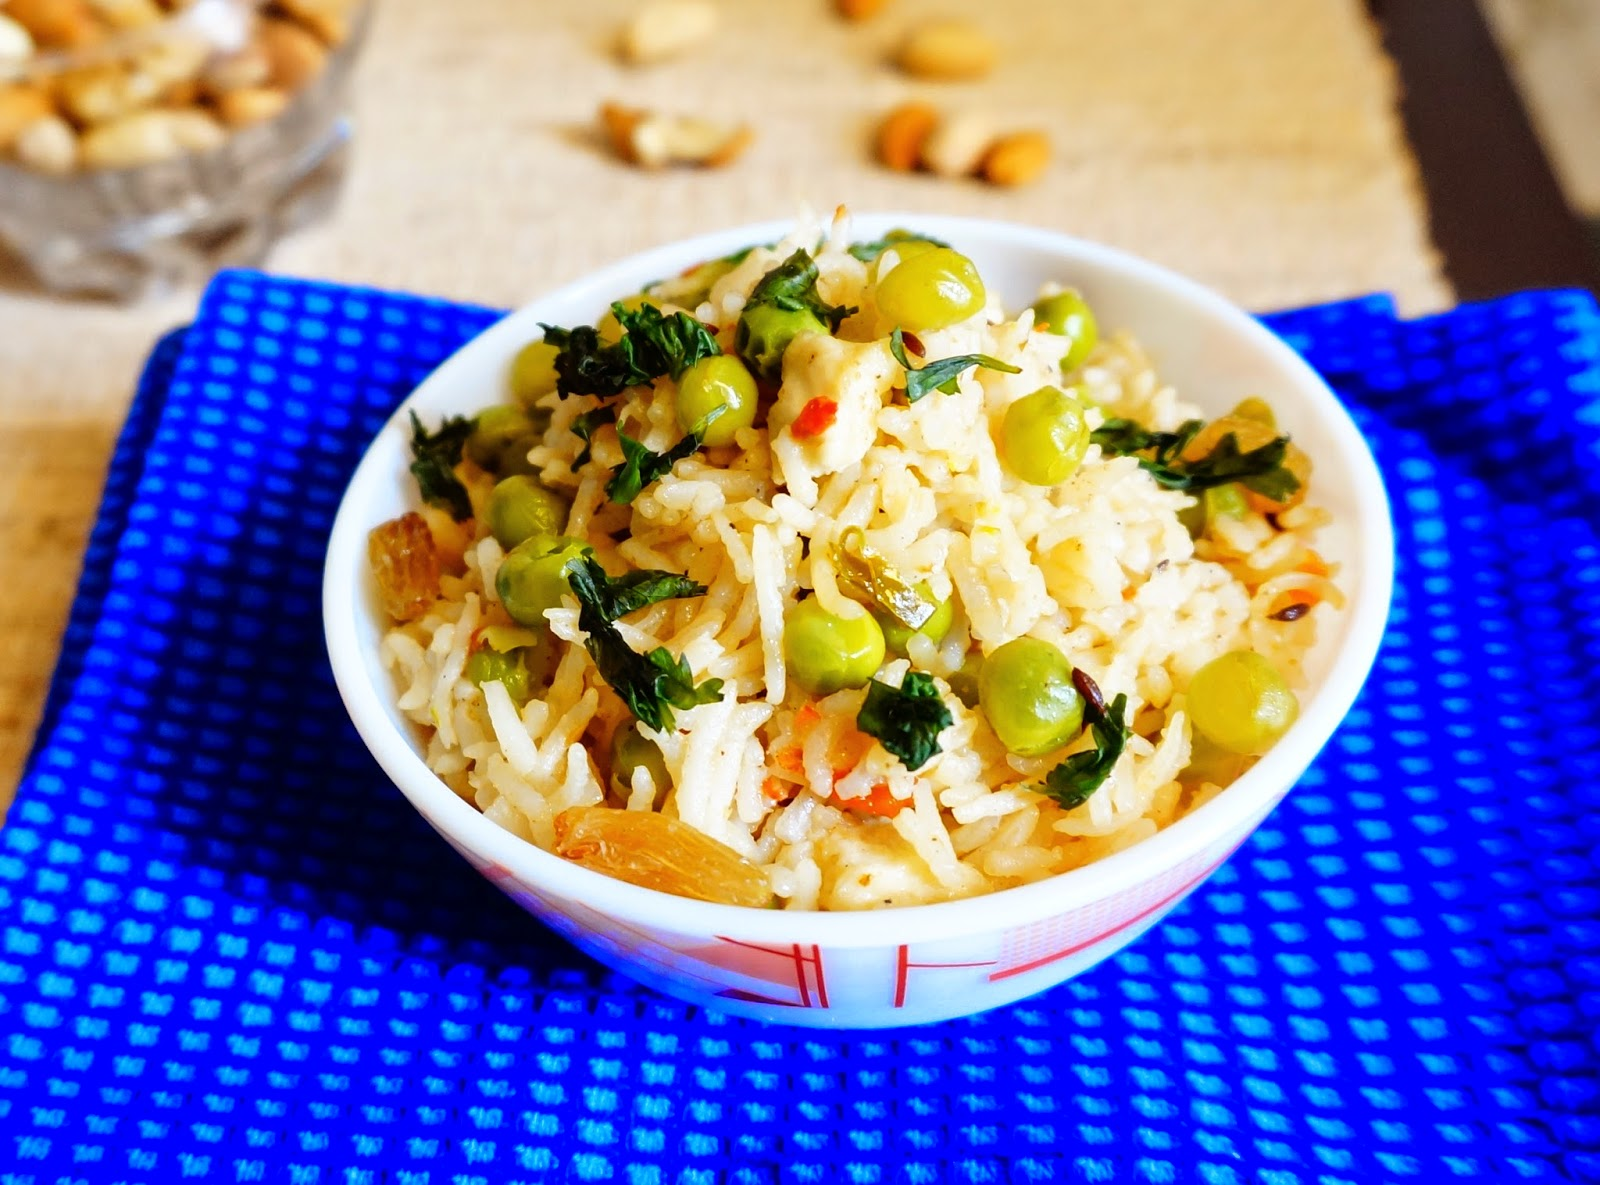 Peas Pulav,Peas Rice,Peas biryani,Matar pulav,matar chawal